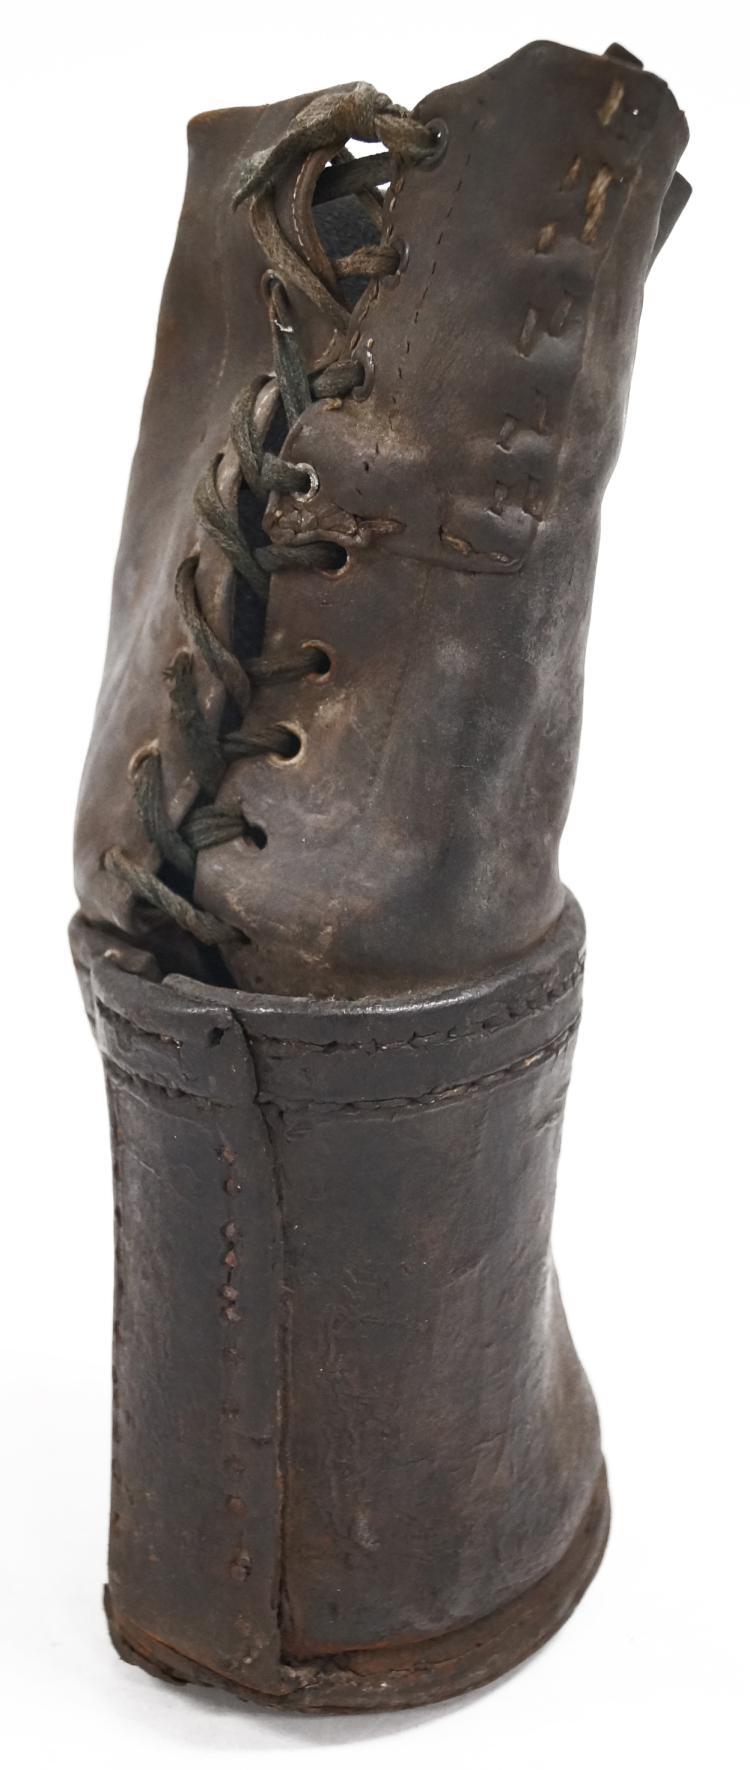 CIVIL WAR ERA LEATHER PROSTHETIC STUMP BOOT/SHOE, 19TH CENTURY. HEIGHT 12